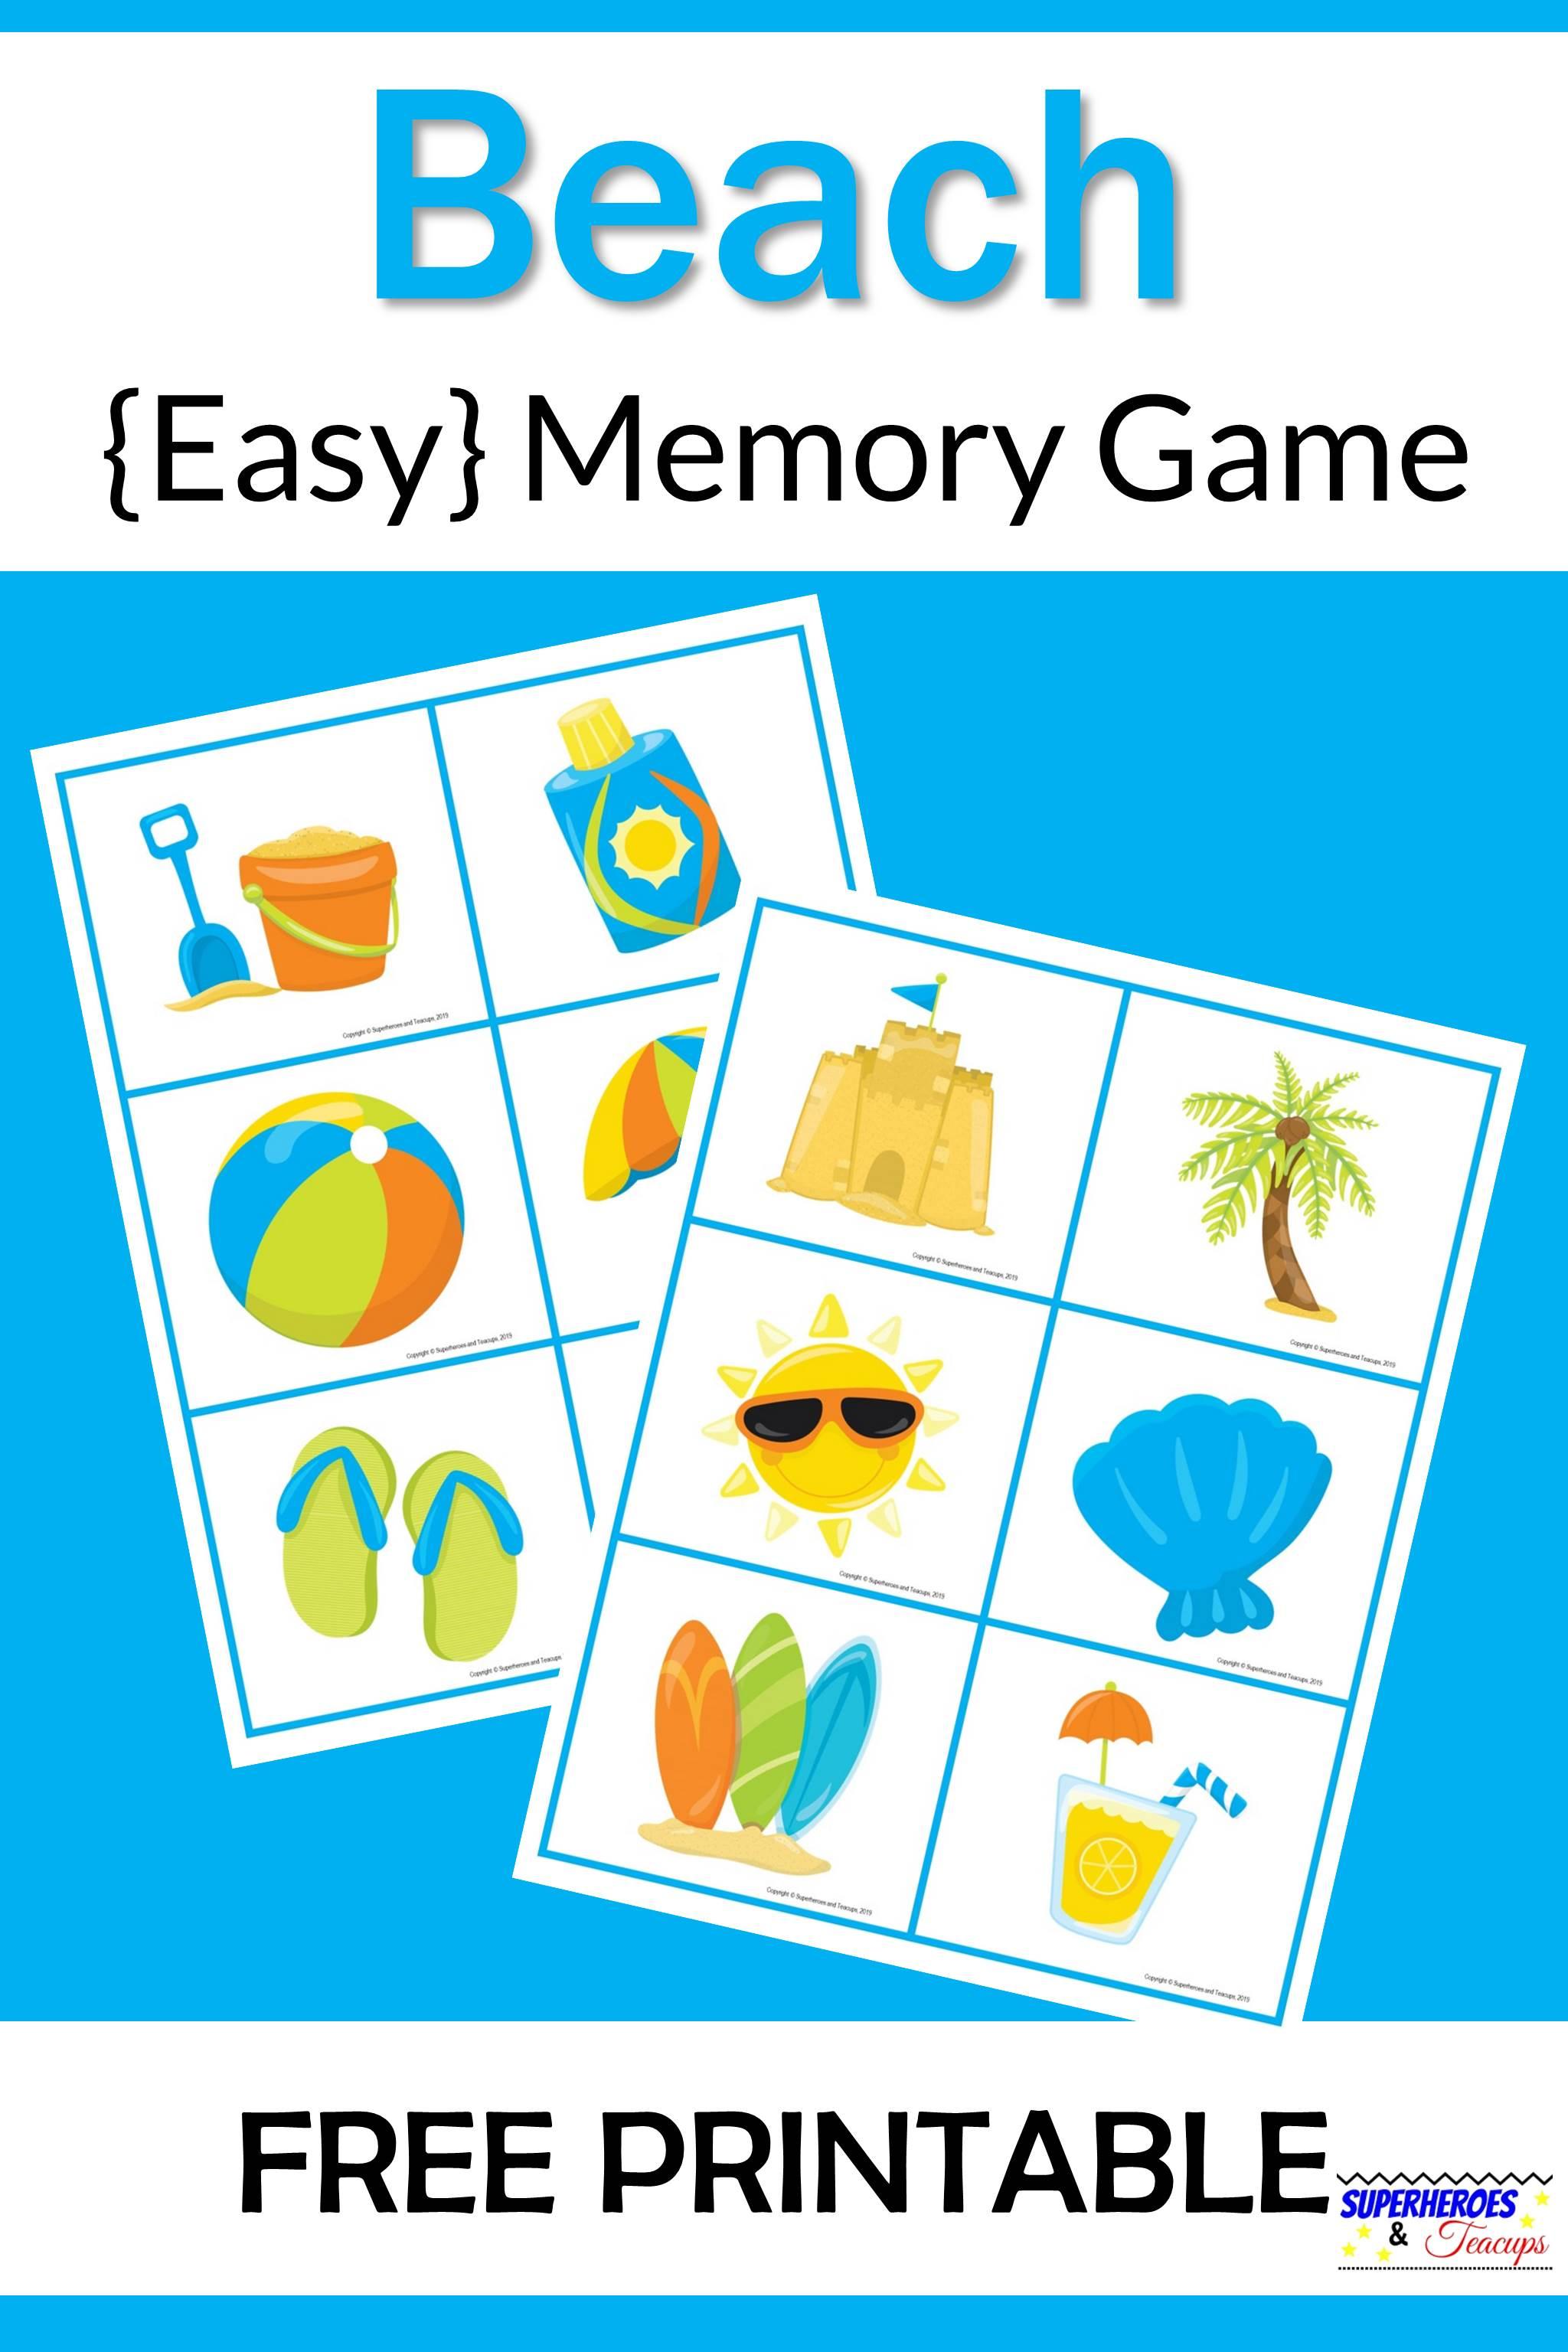 Beach Memory Game Free Printable for Kids